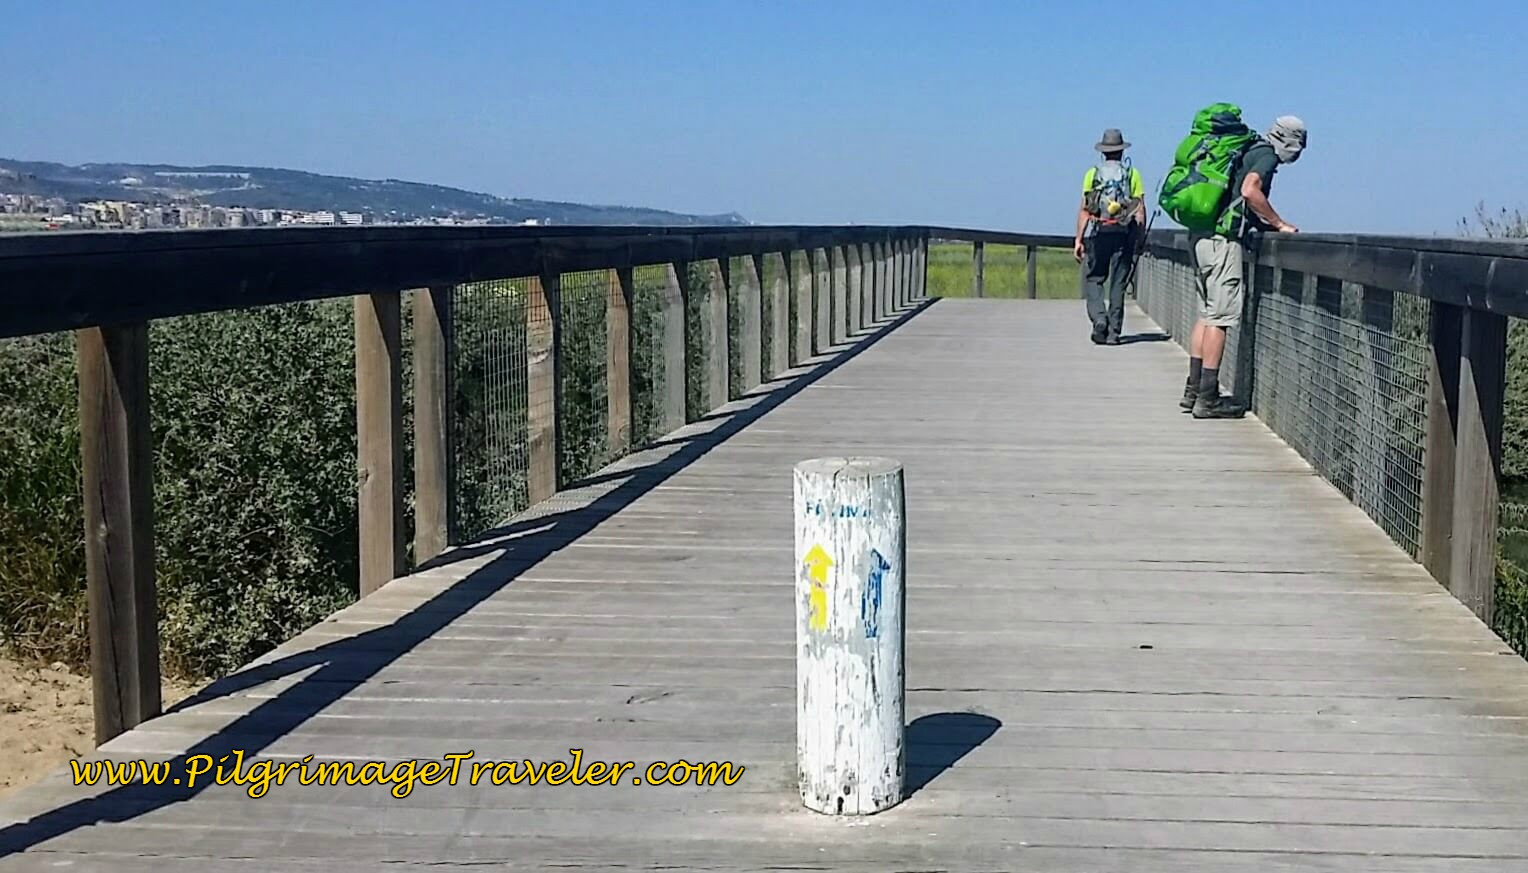 Entrance to the Boardwalk at Fisherman's Beach, Alverca do Ribatejo, Portugal